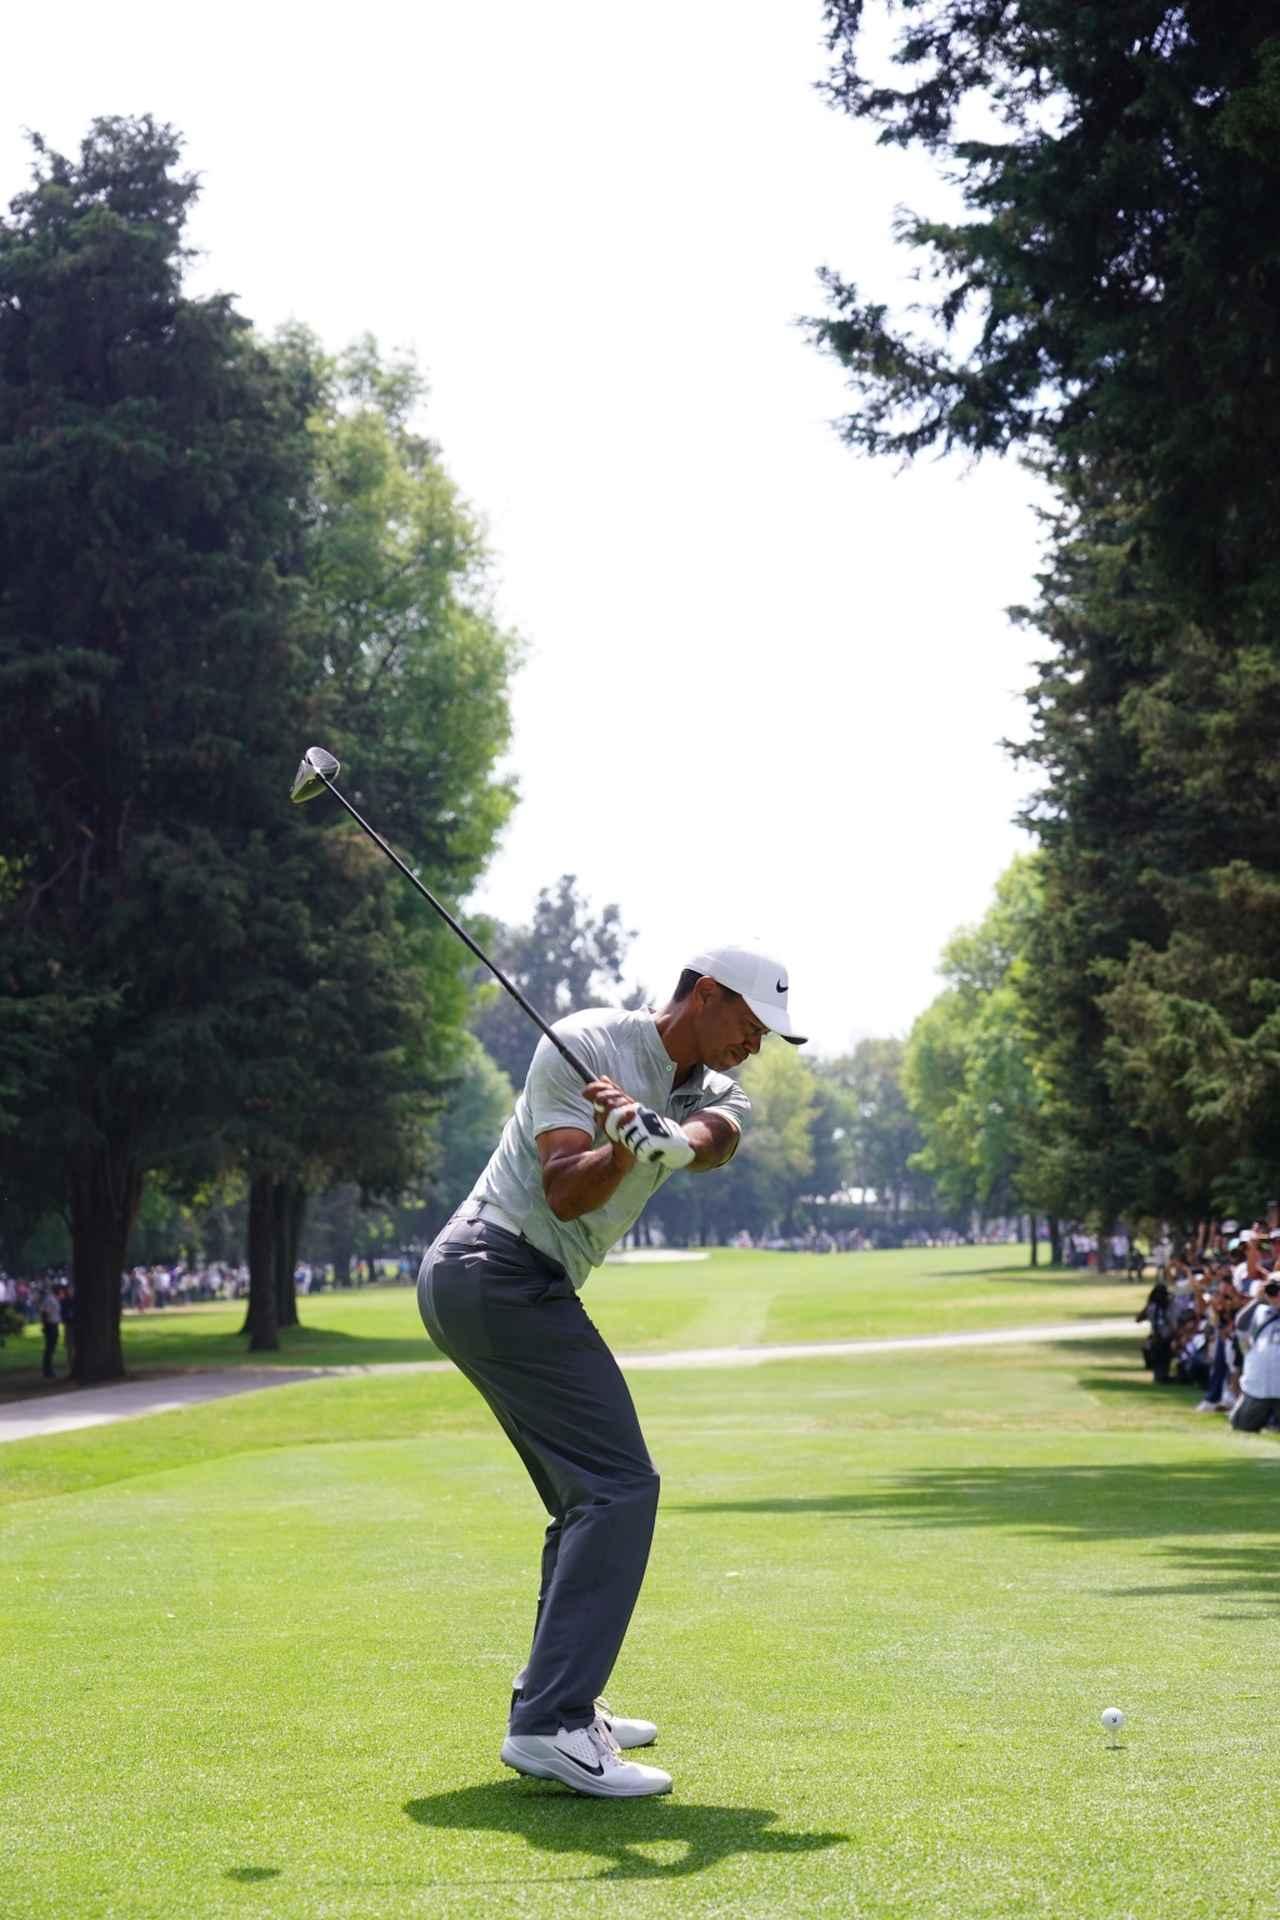 Images : 7番目の画像 - タイガー・ウッズのドライバー連続写真 - みんなのゴルフダイジェスト